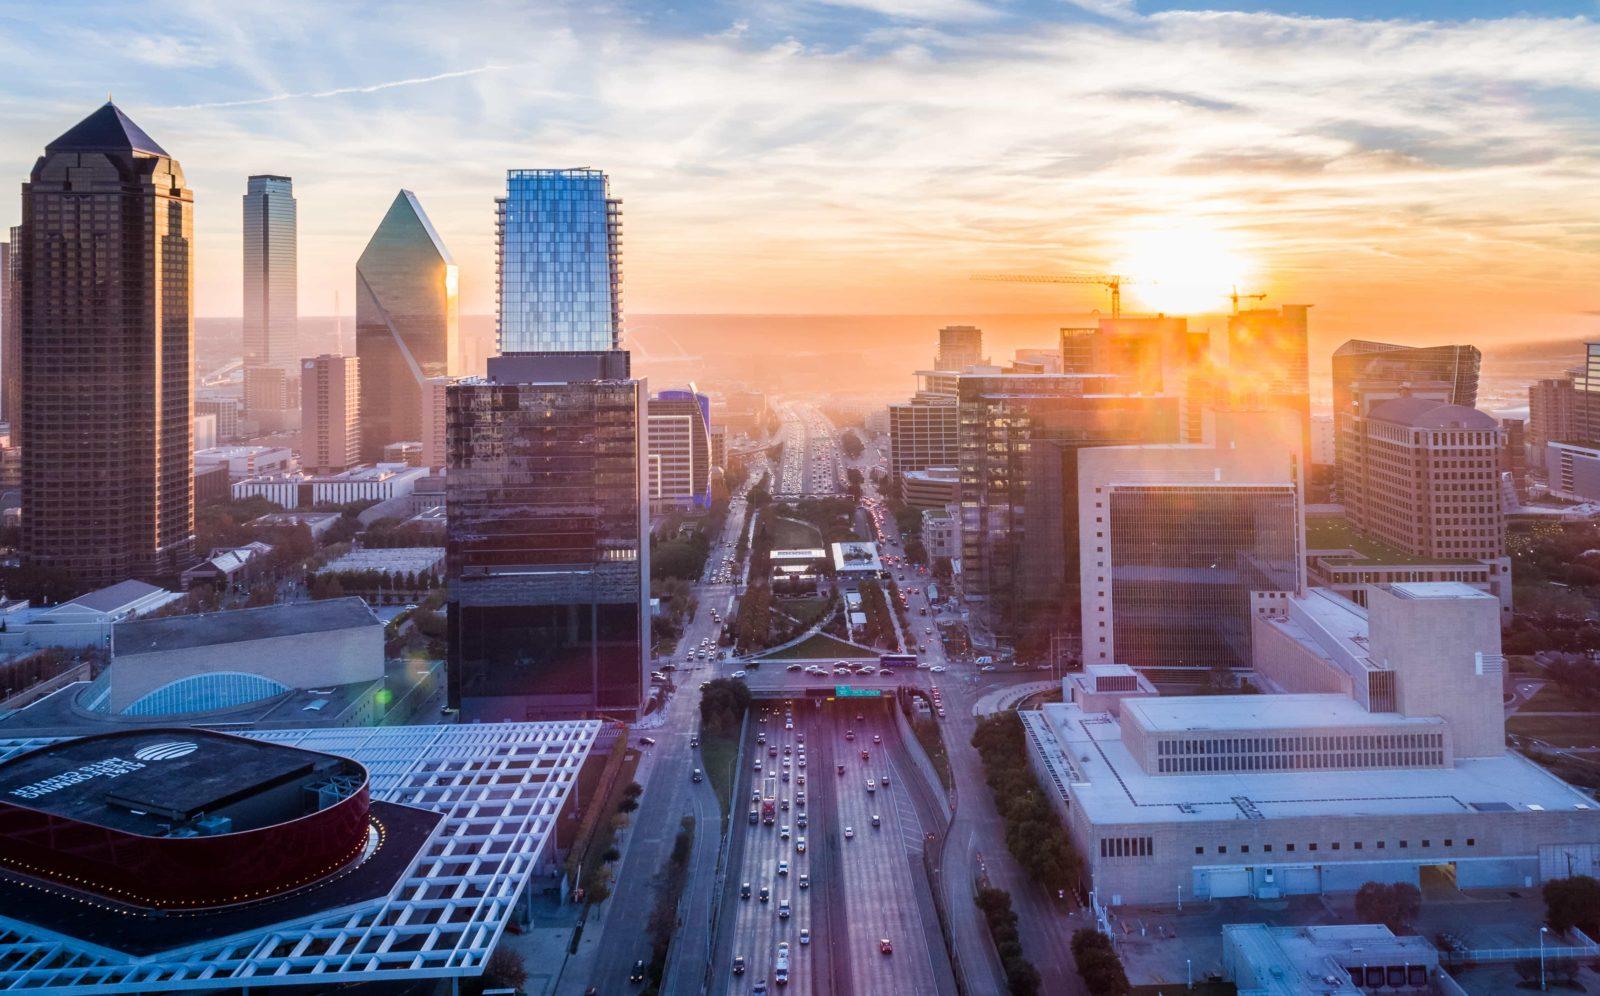 Dallas Skyline in the evening